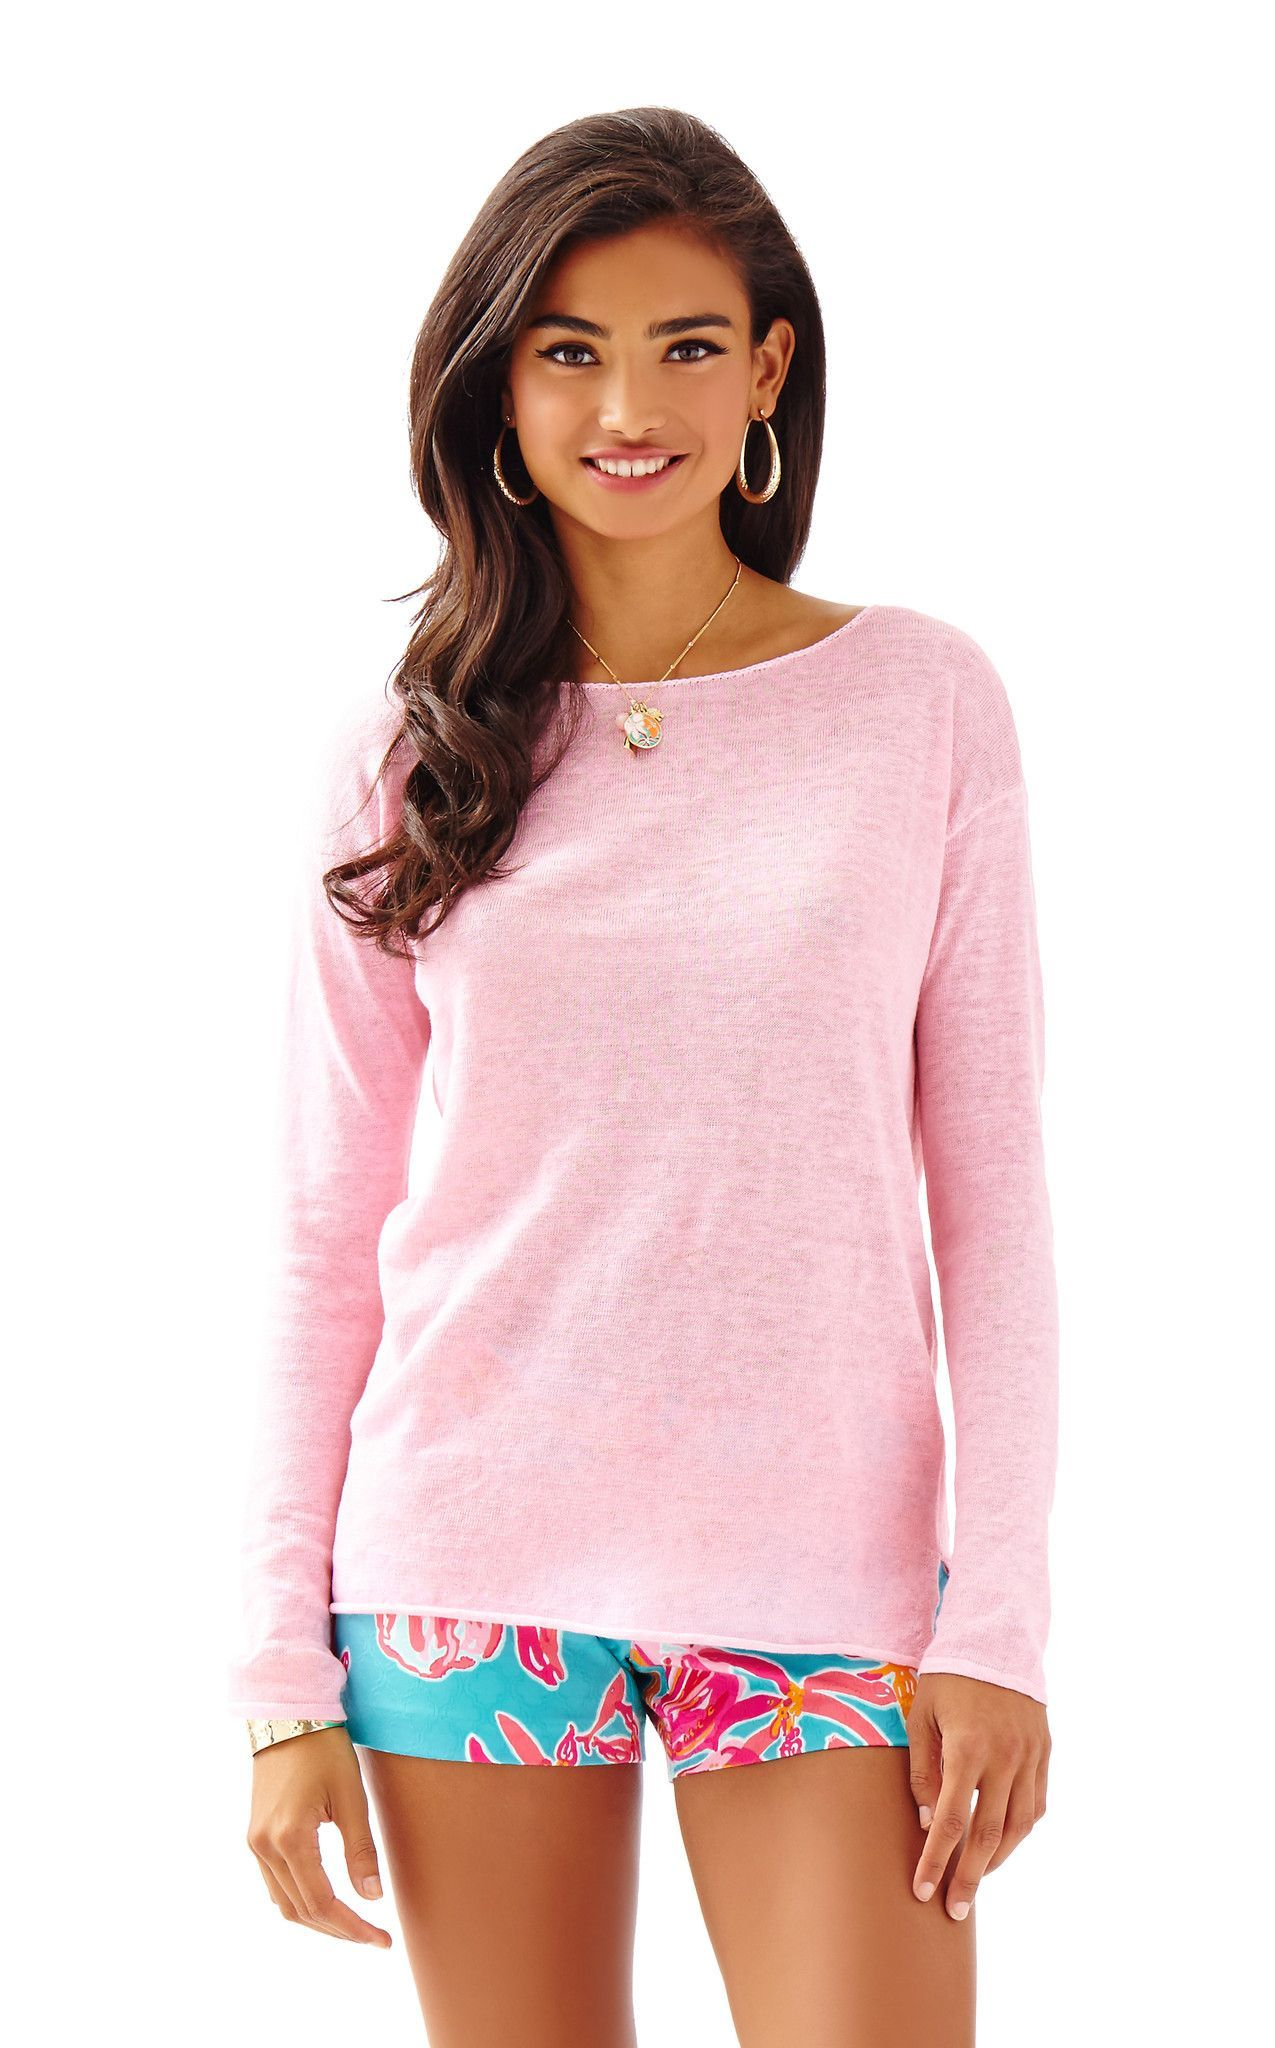 Alana Sweater in Paradise Pink | Hermosa Sonrisa | Pinterest ...